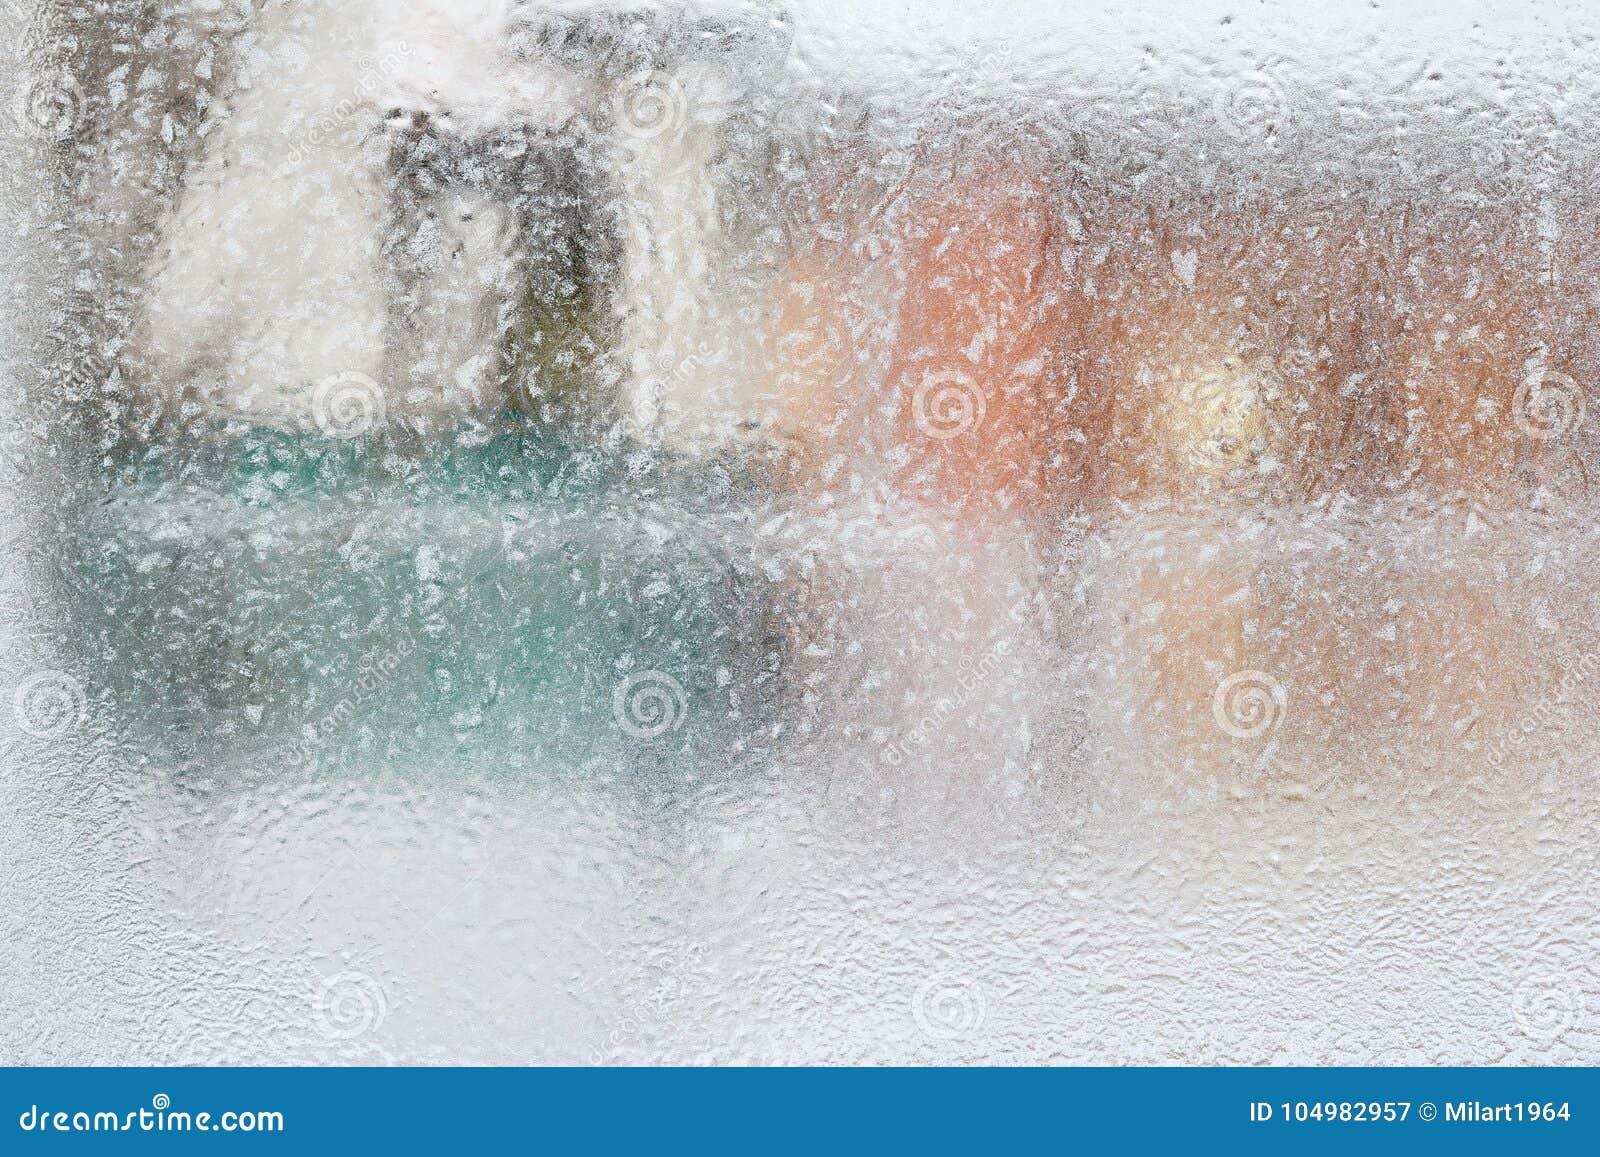 Frosty pattern on glass winter window, look through glass